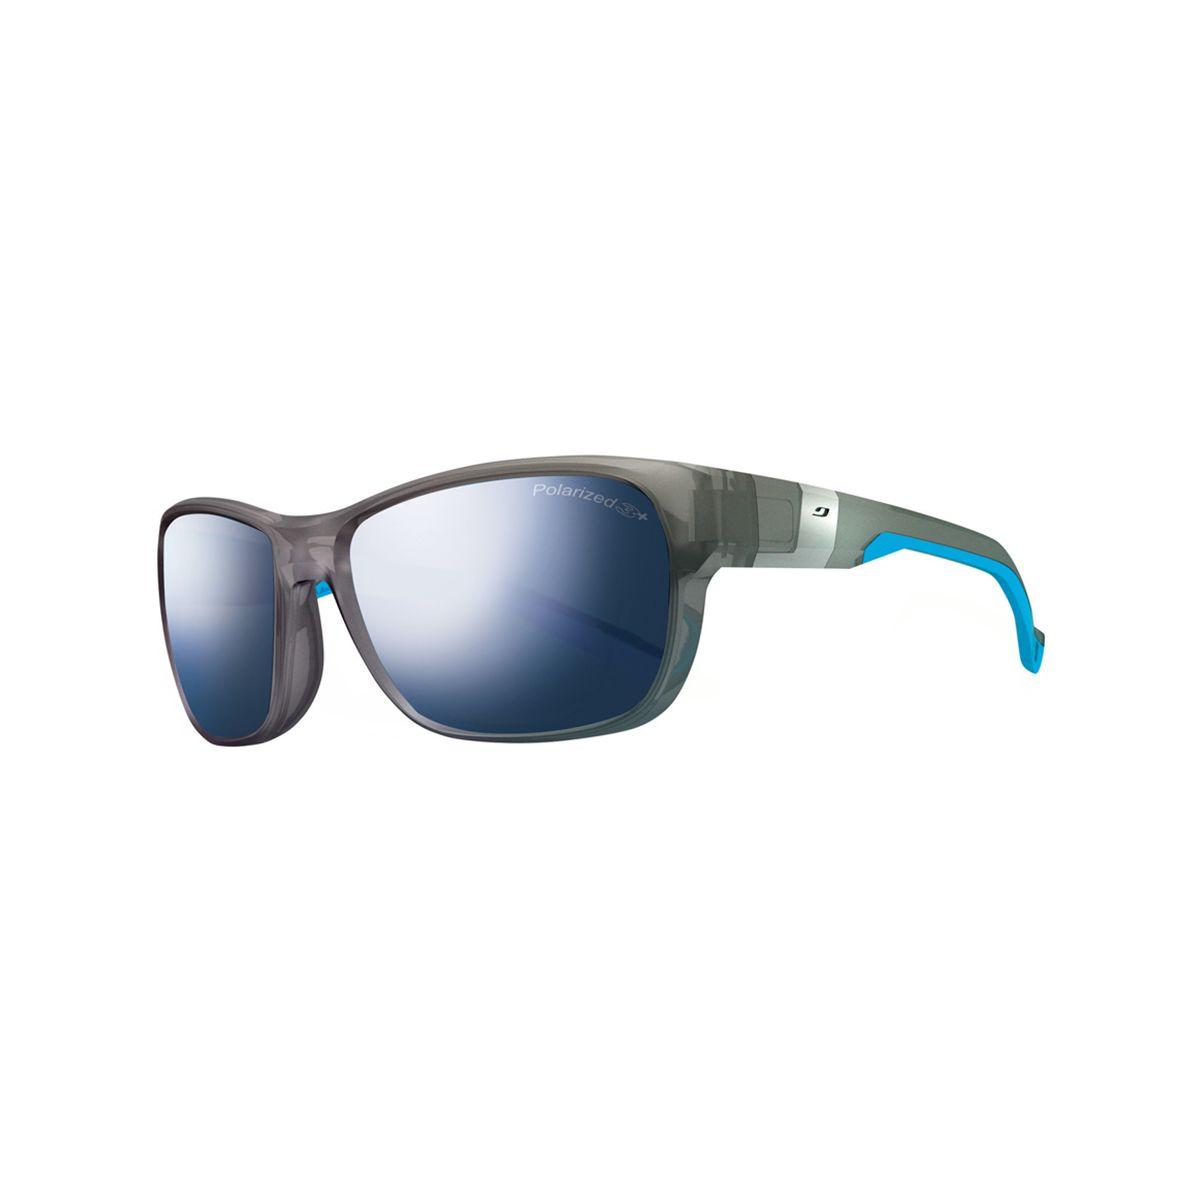 33bb9561a9b Julbo Race Polarized Sunglasses